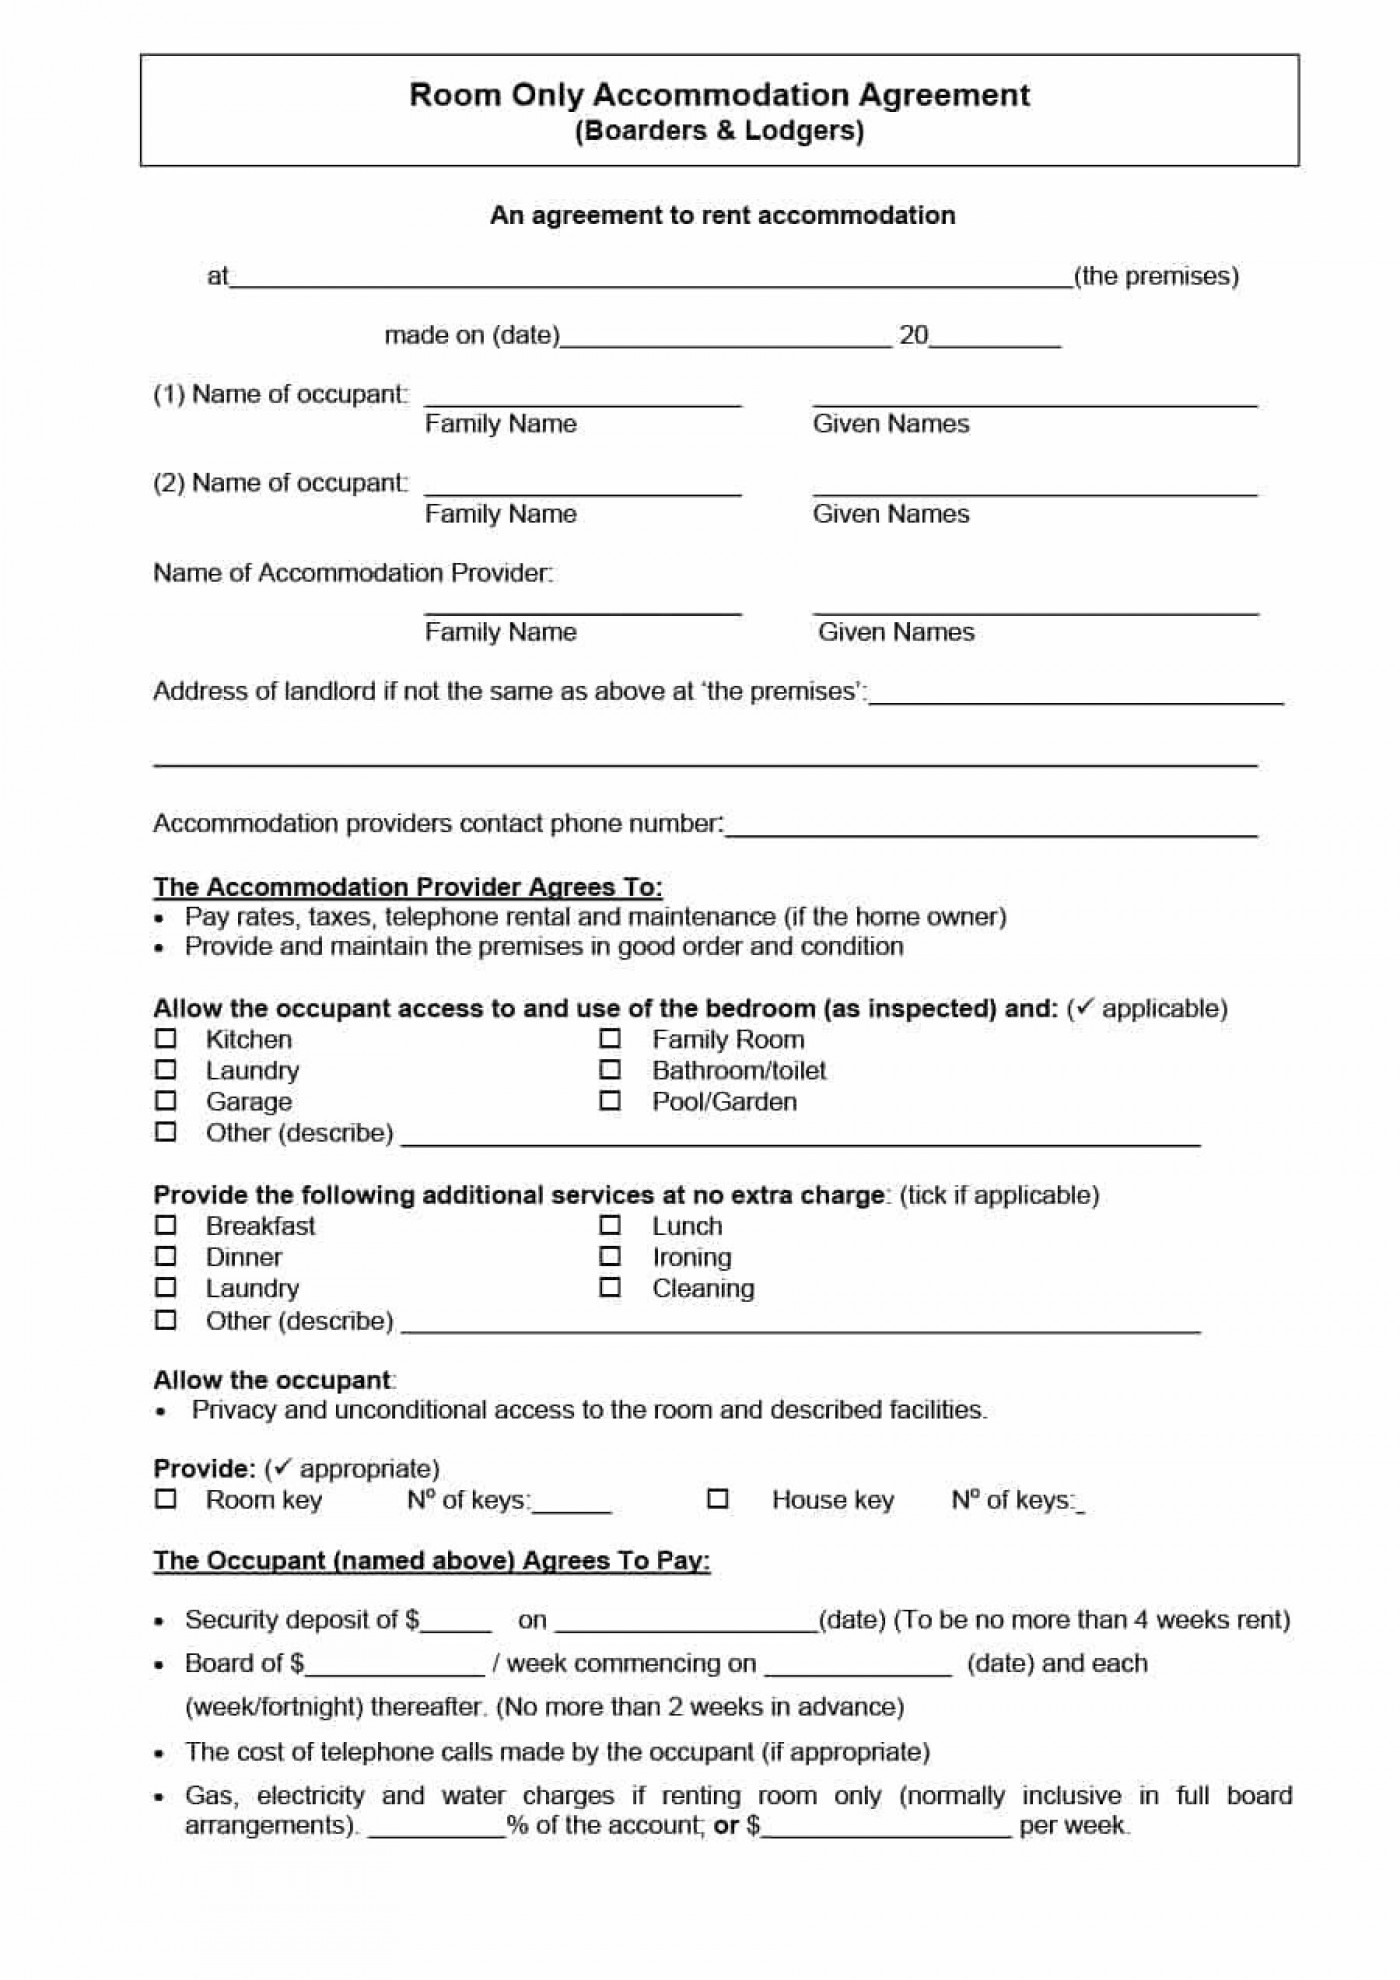 003 Sensational Generic Room Rental Agreement Free Inspiration  Printable1400